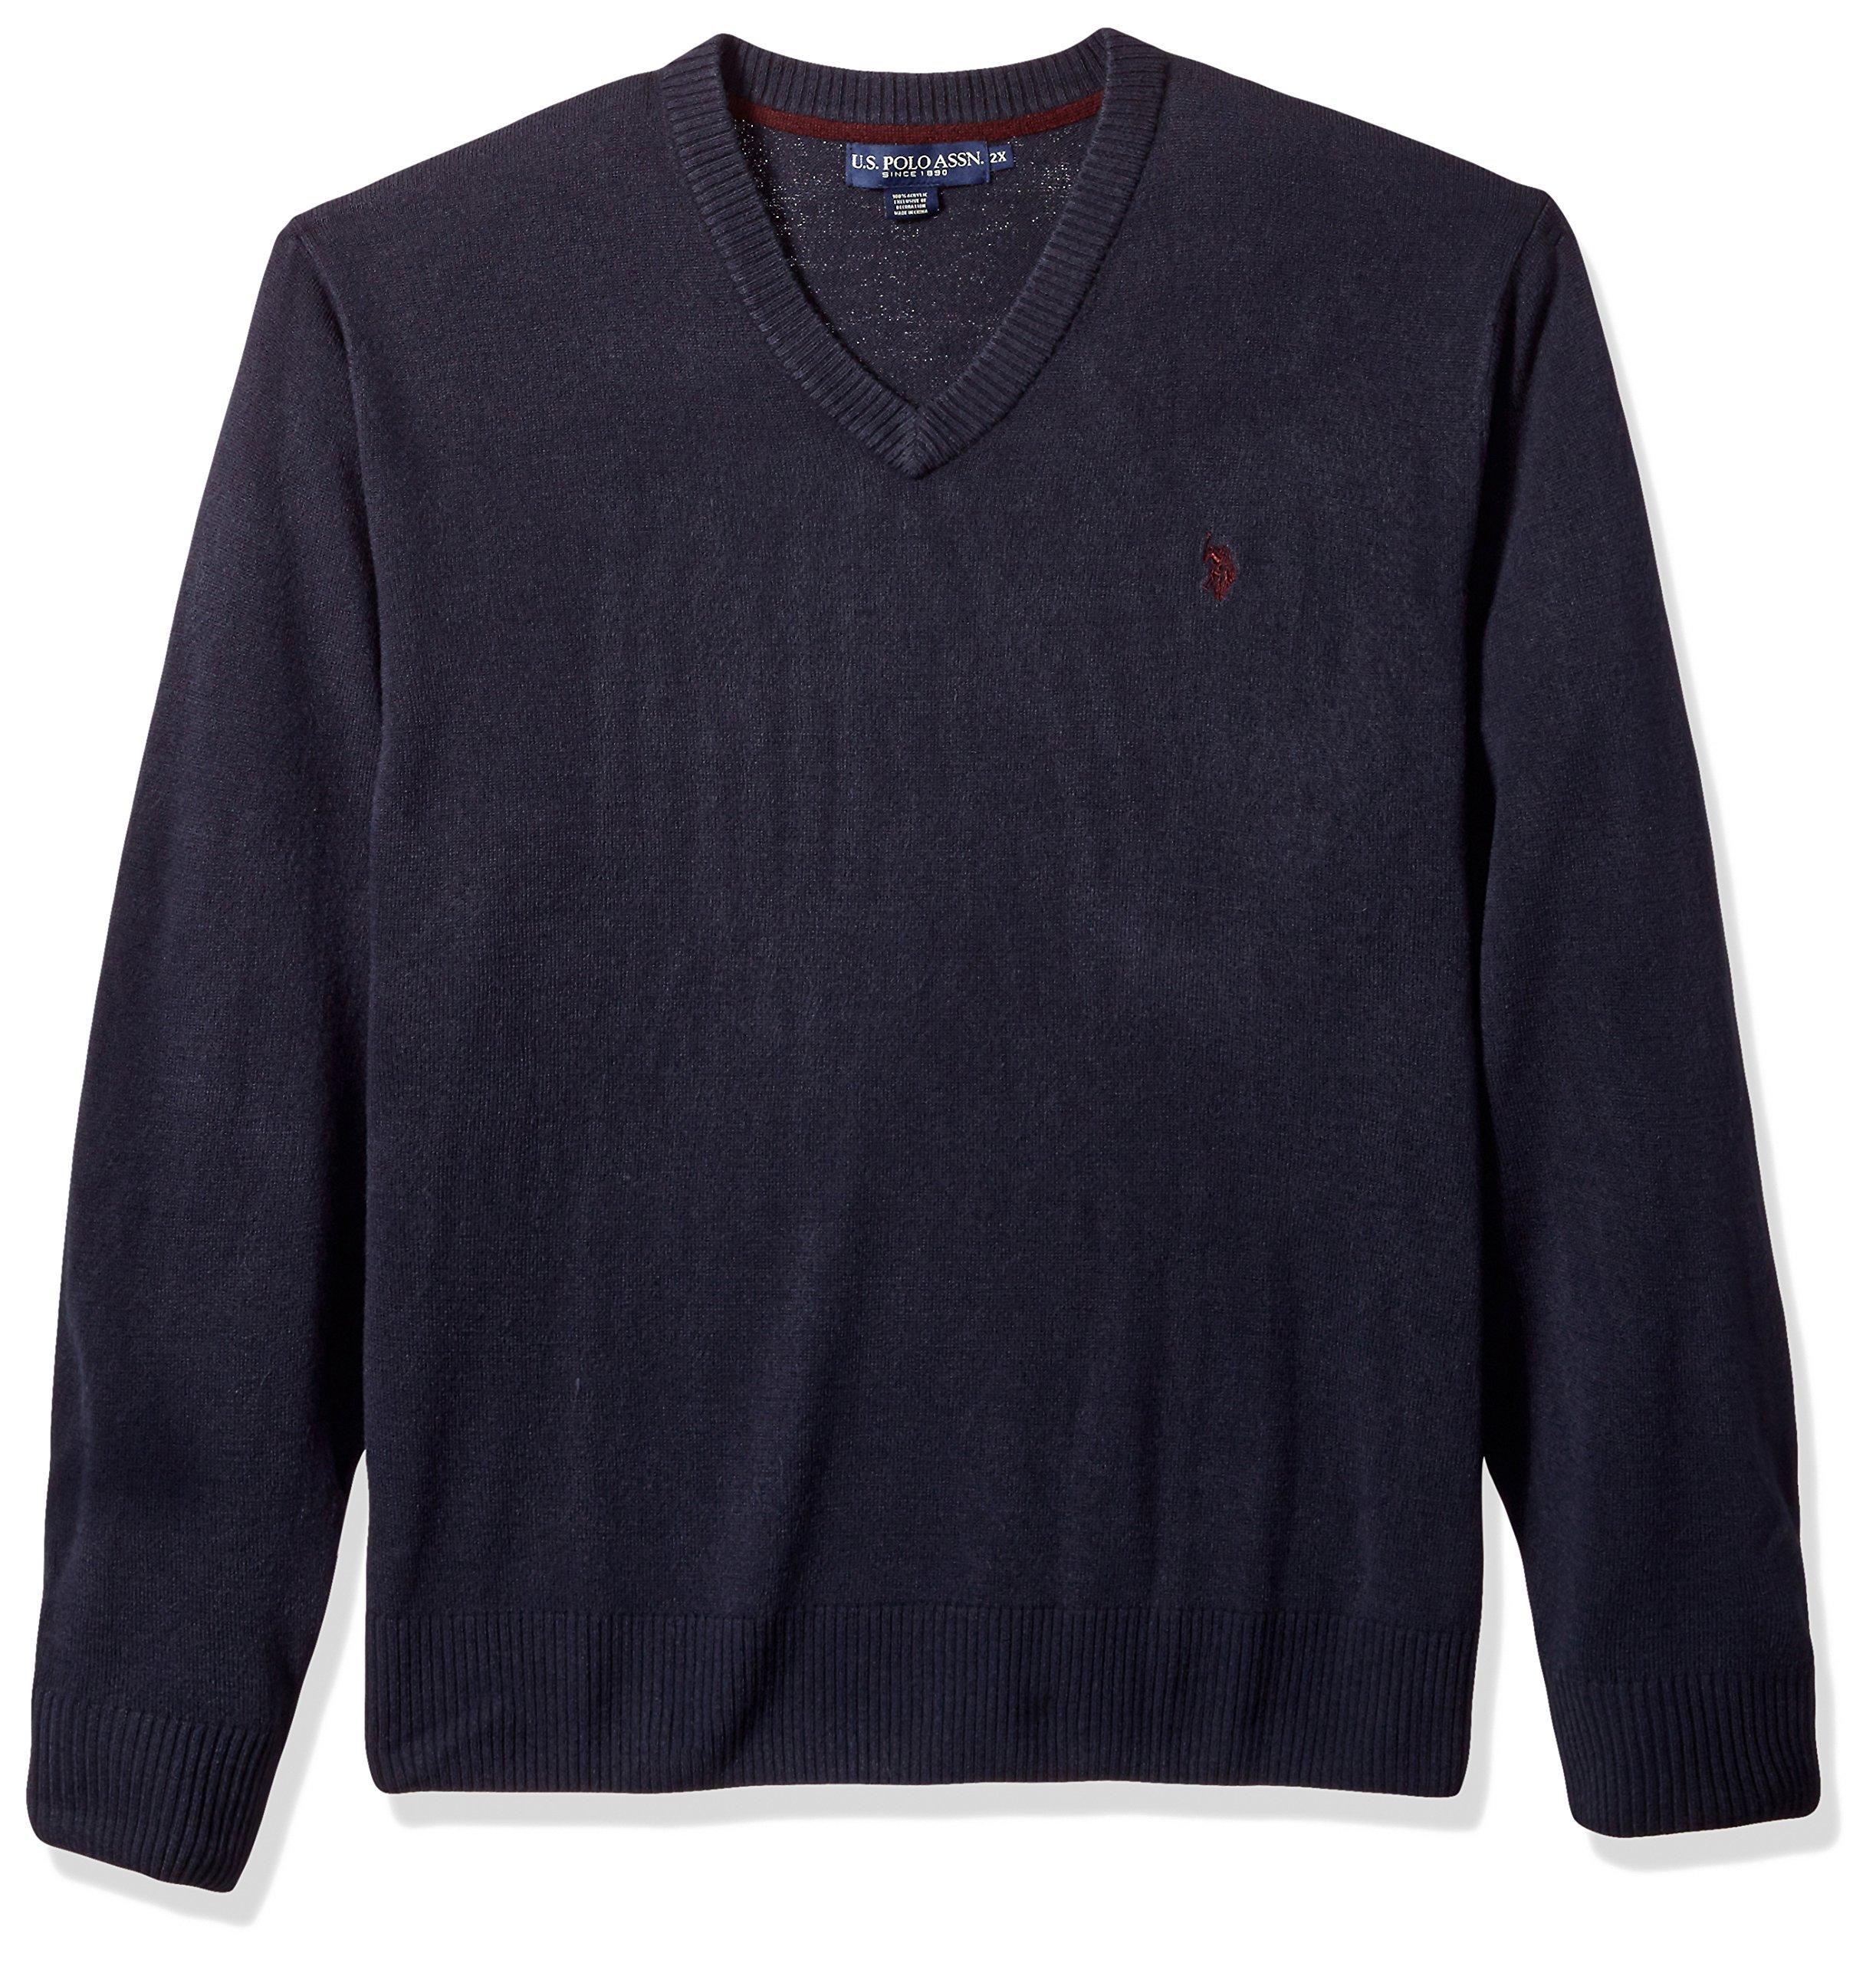 U.S. Polo Assn. Men's Tall Solid V-Neck Sweater, Navy, 2X Big